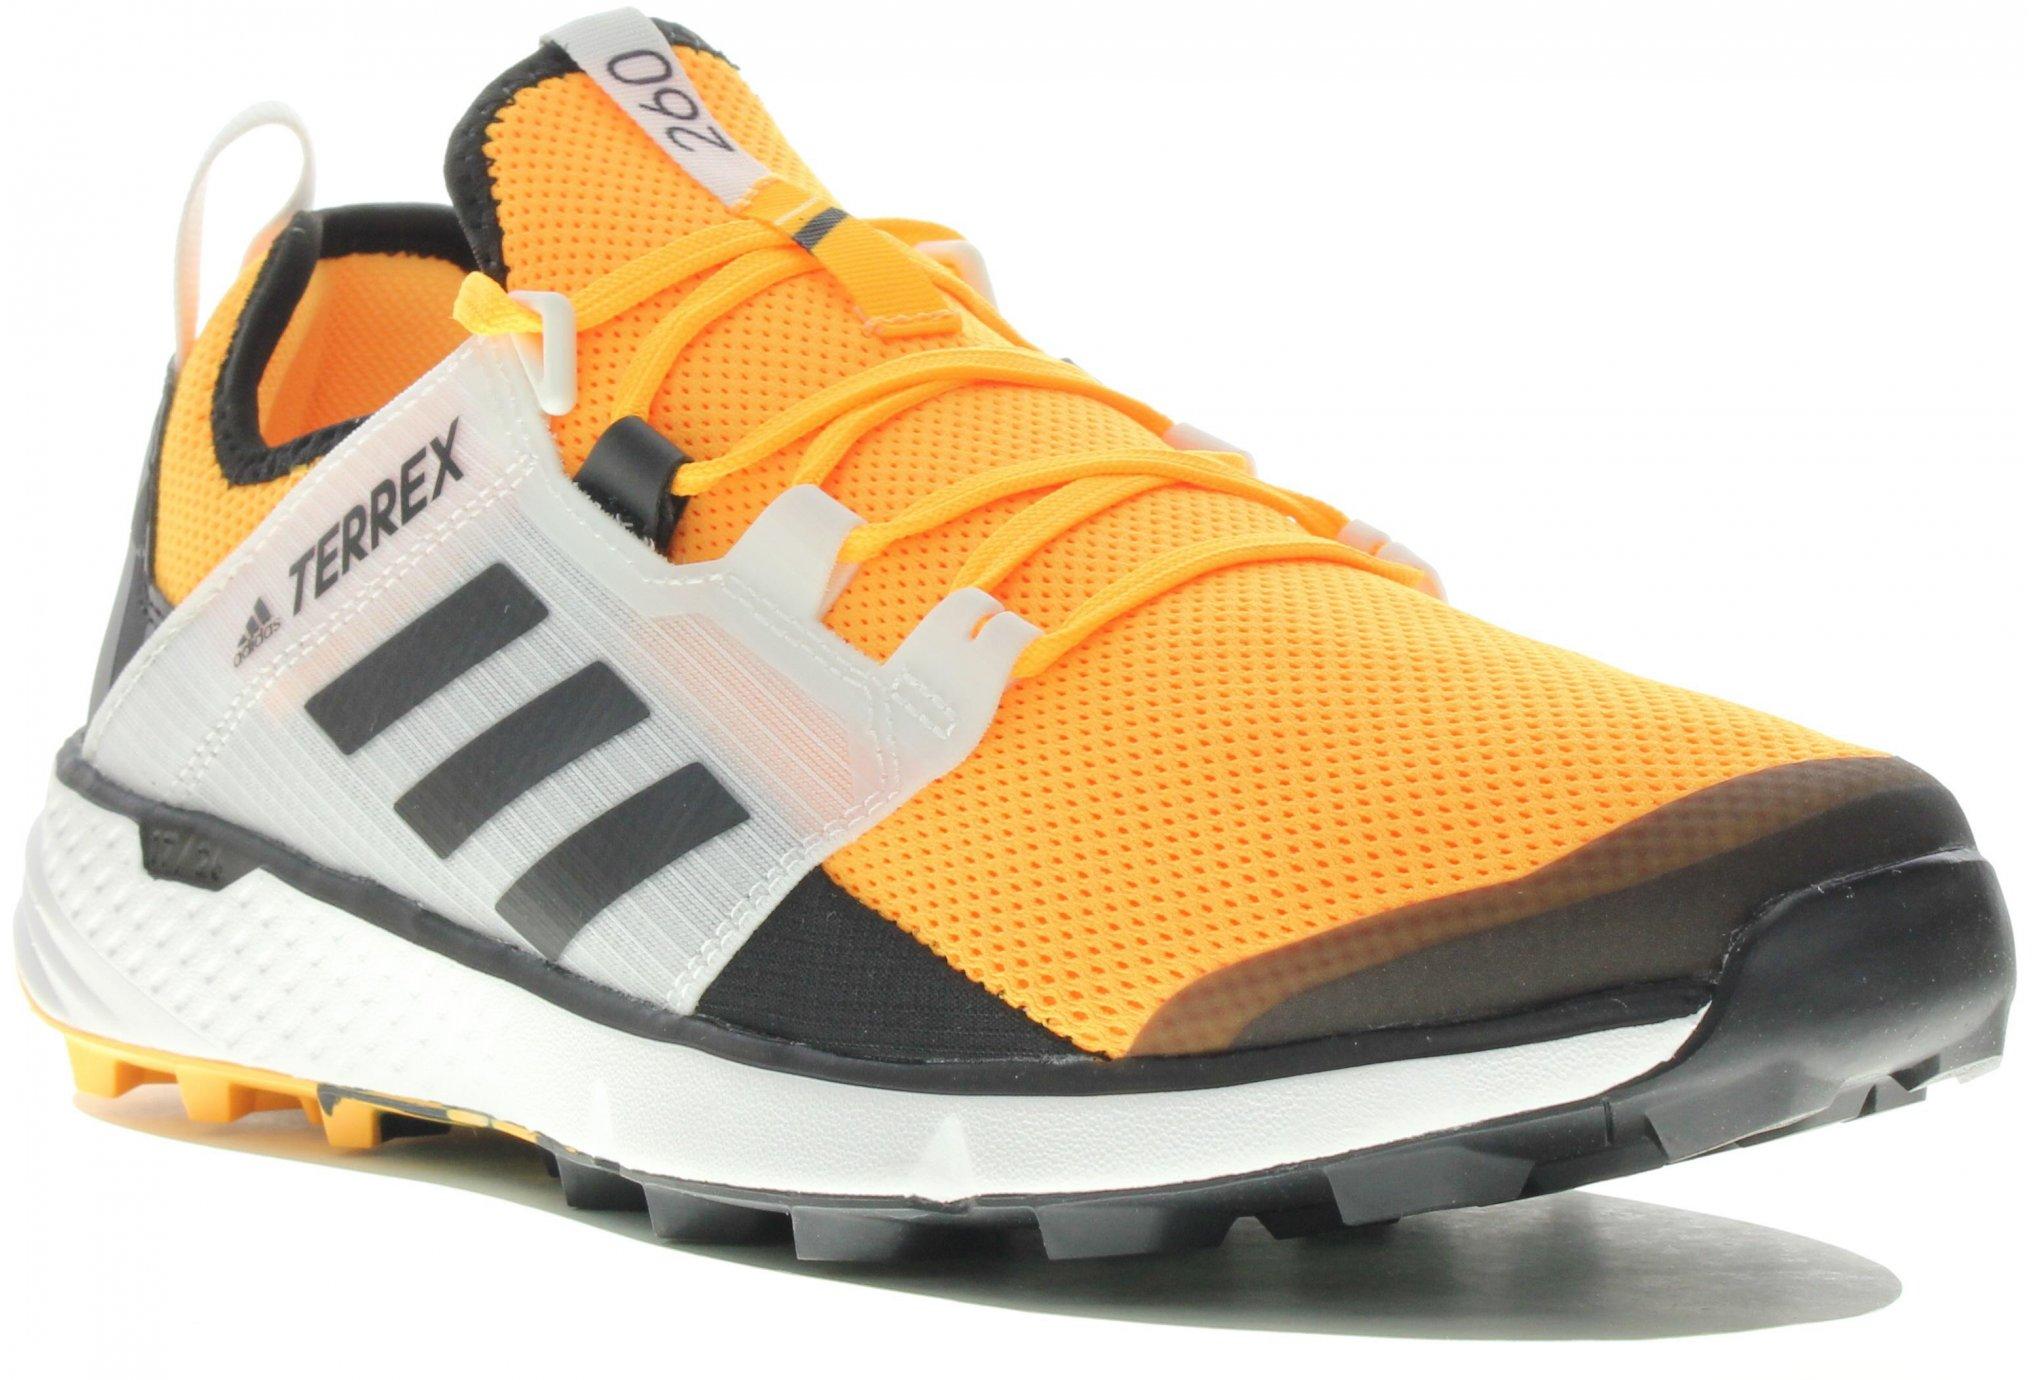 adidas Terrex Speed LD Chaussures homme